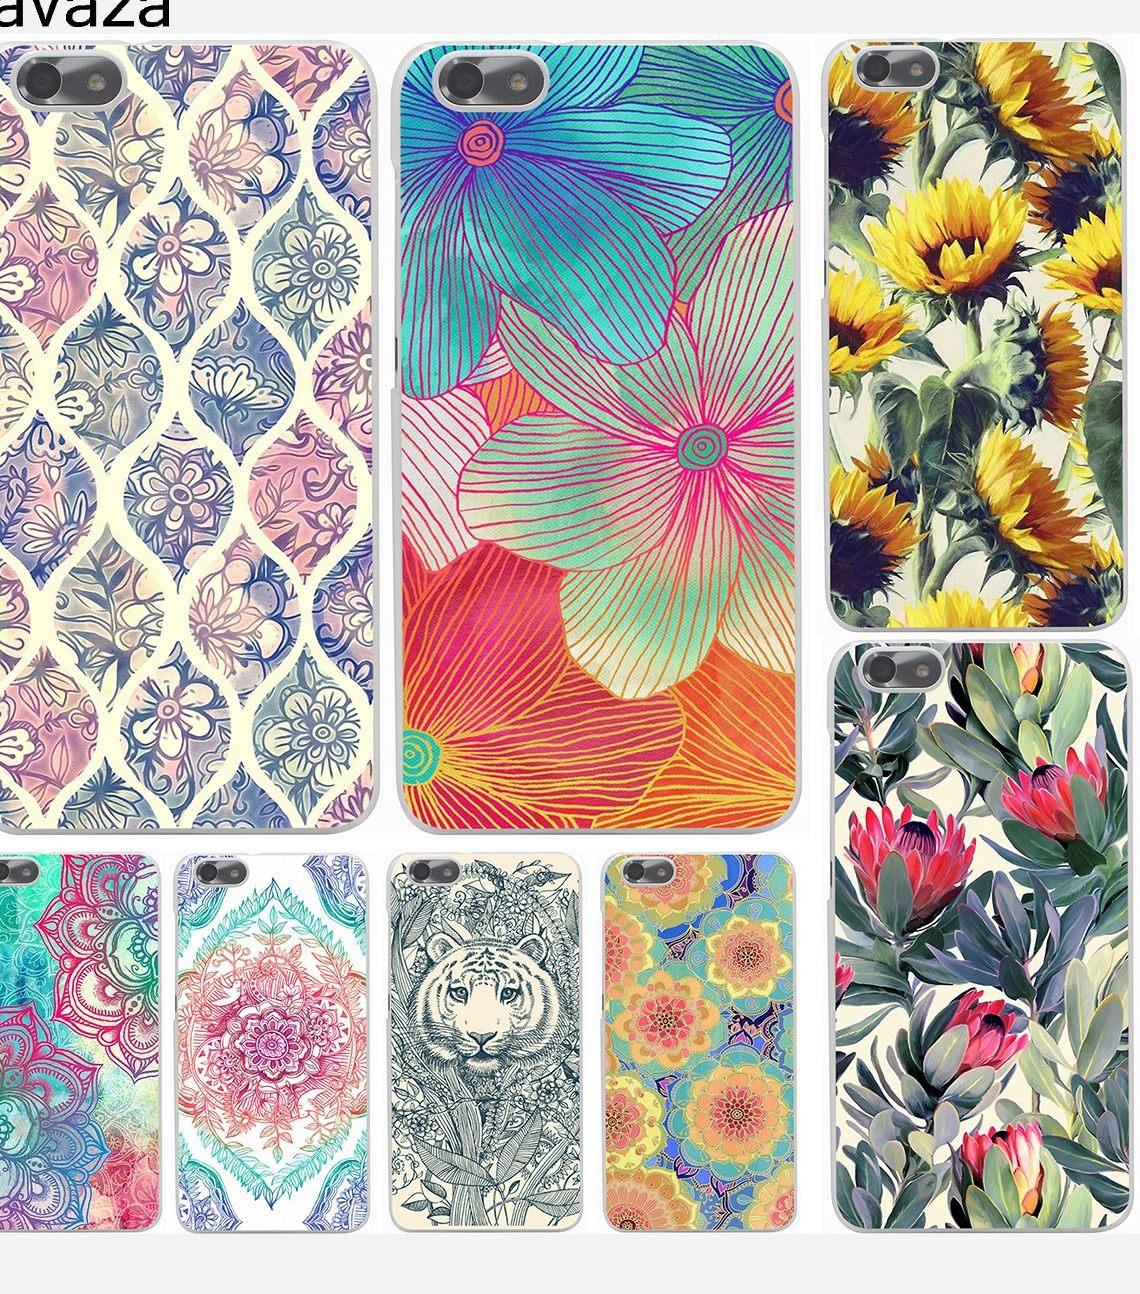 Huawei Mate 10 Lite Pas Cher Inspiré ④lavaza МандаРа Цветок дурмана Цветочный Жесткий ЧехоРдРя Huawei